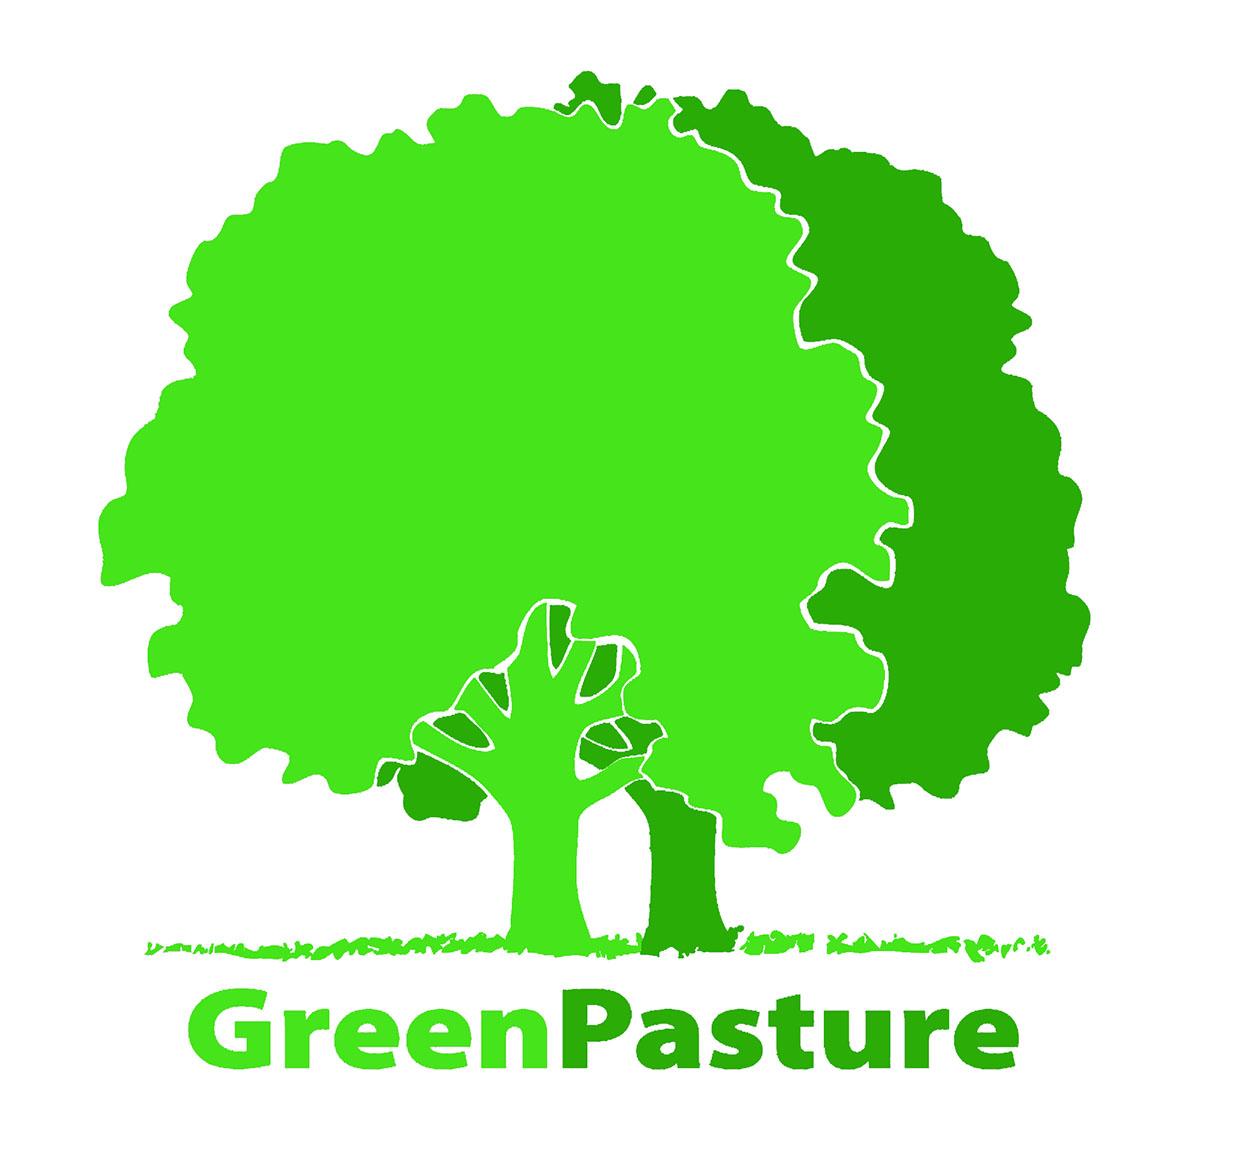 Green Pasture